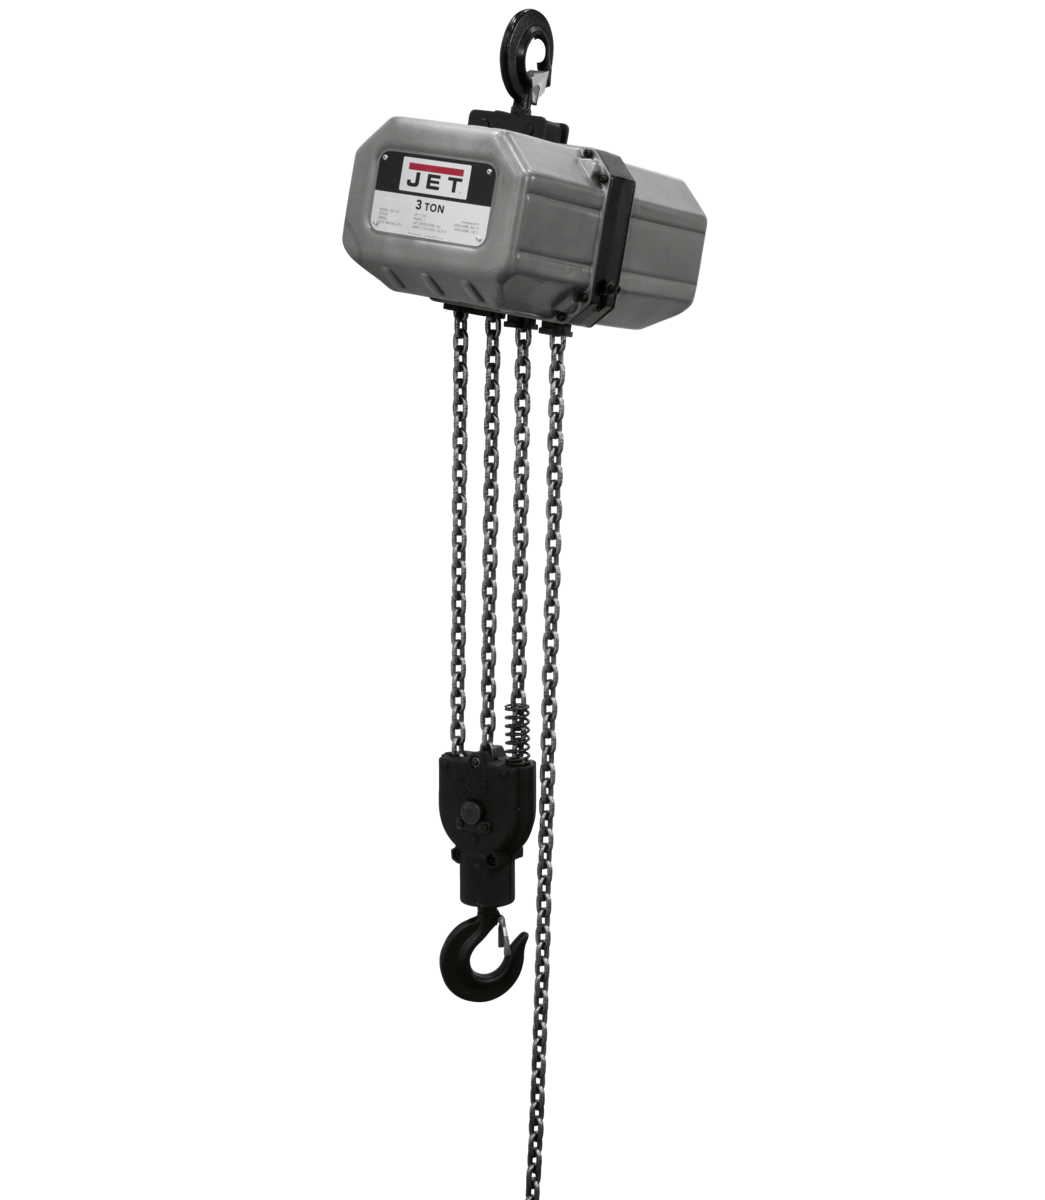 3SS-1C-15, 3-Ton Electric Chain Hoist 1-Phase 15' Lift